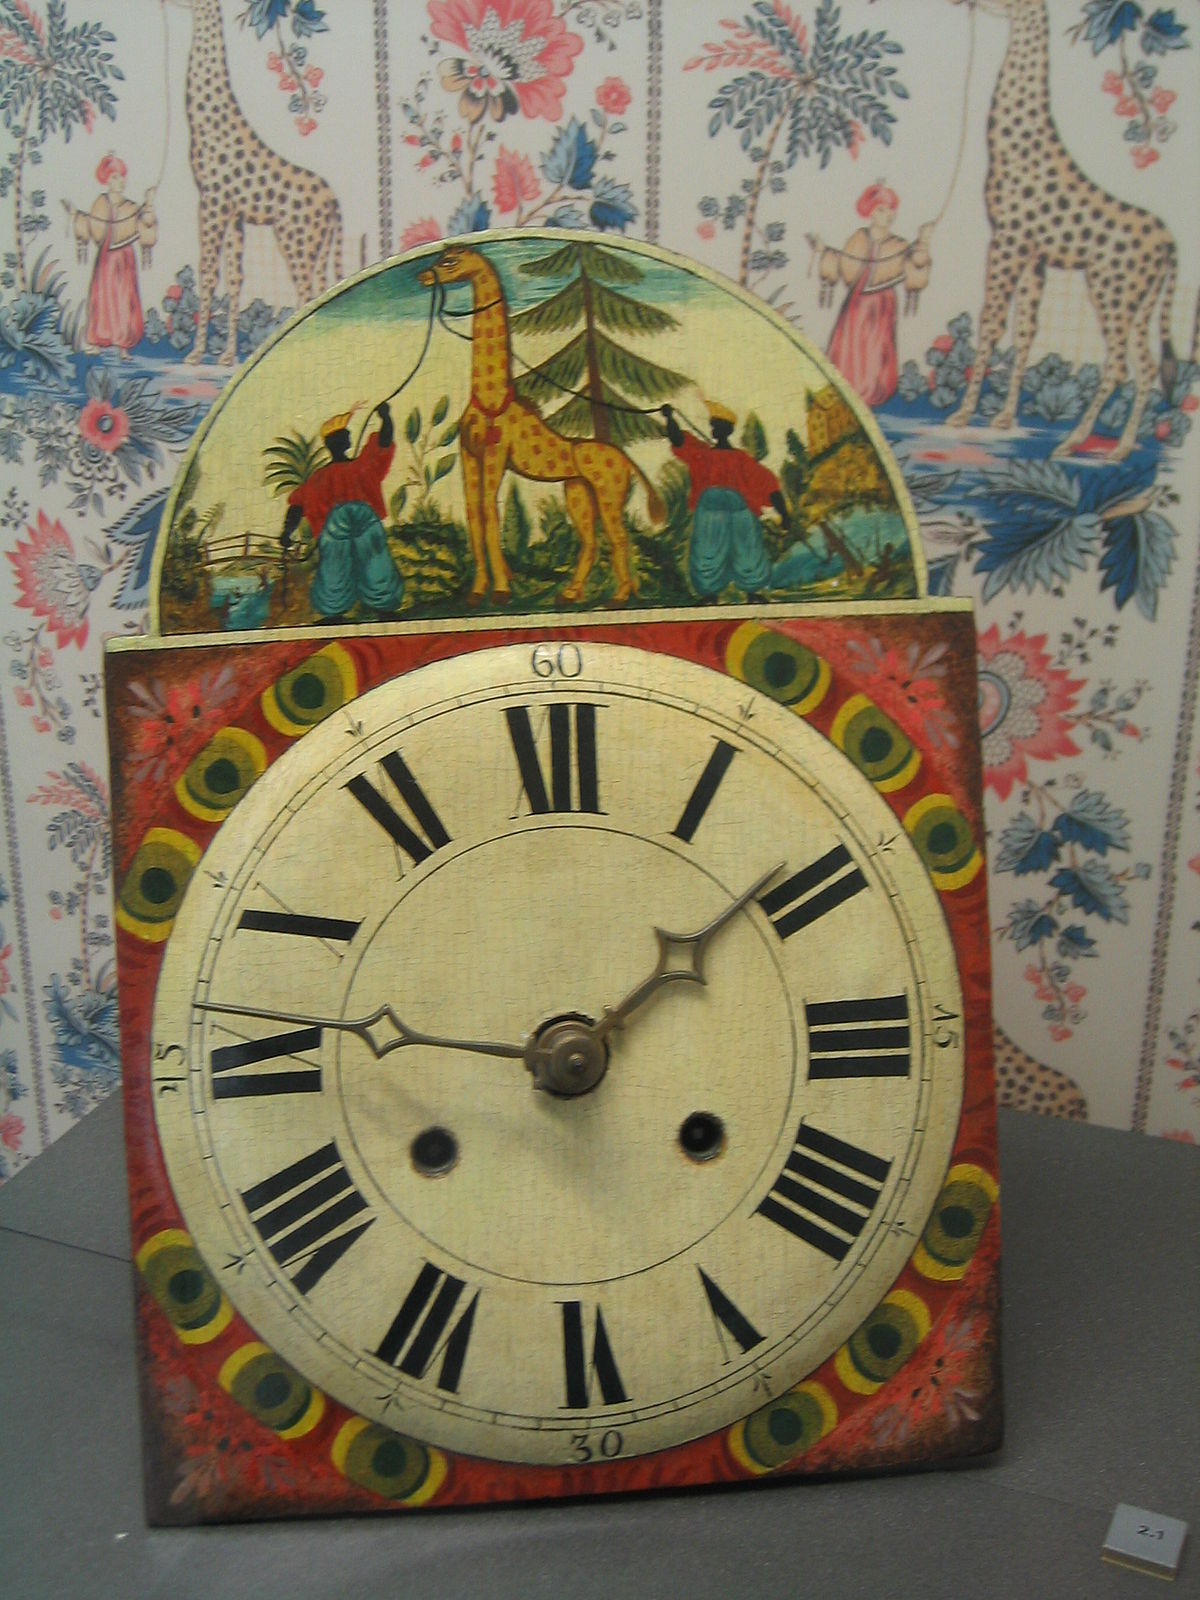 Lackschild uhr wikipedia - Decoracion relojes de pared ...